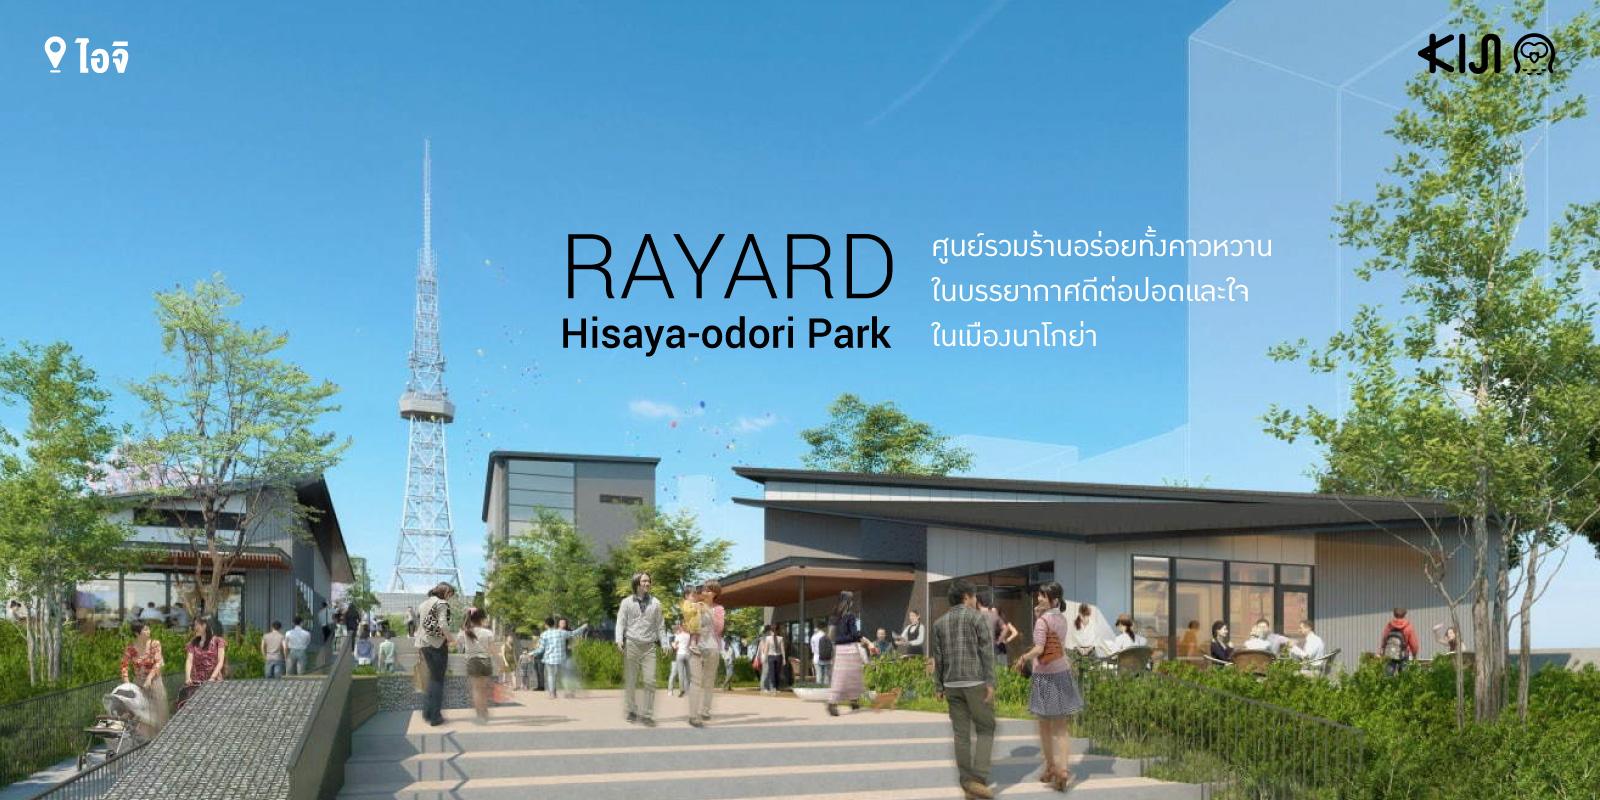 RAYARD Hisaya-odori Park, Nagoya